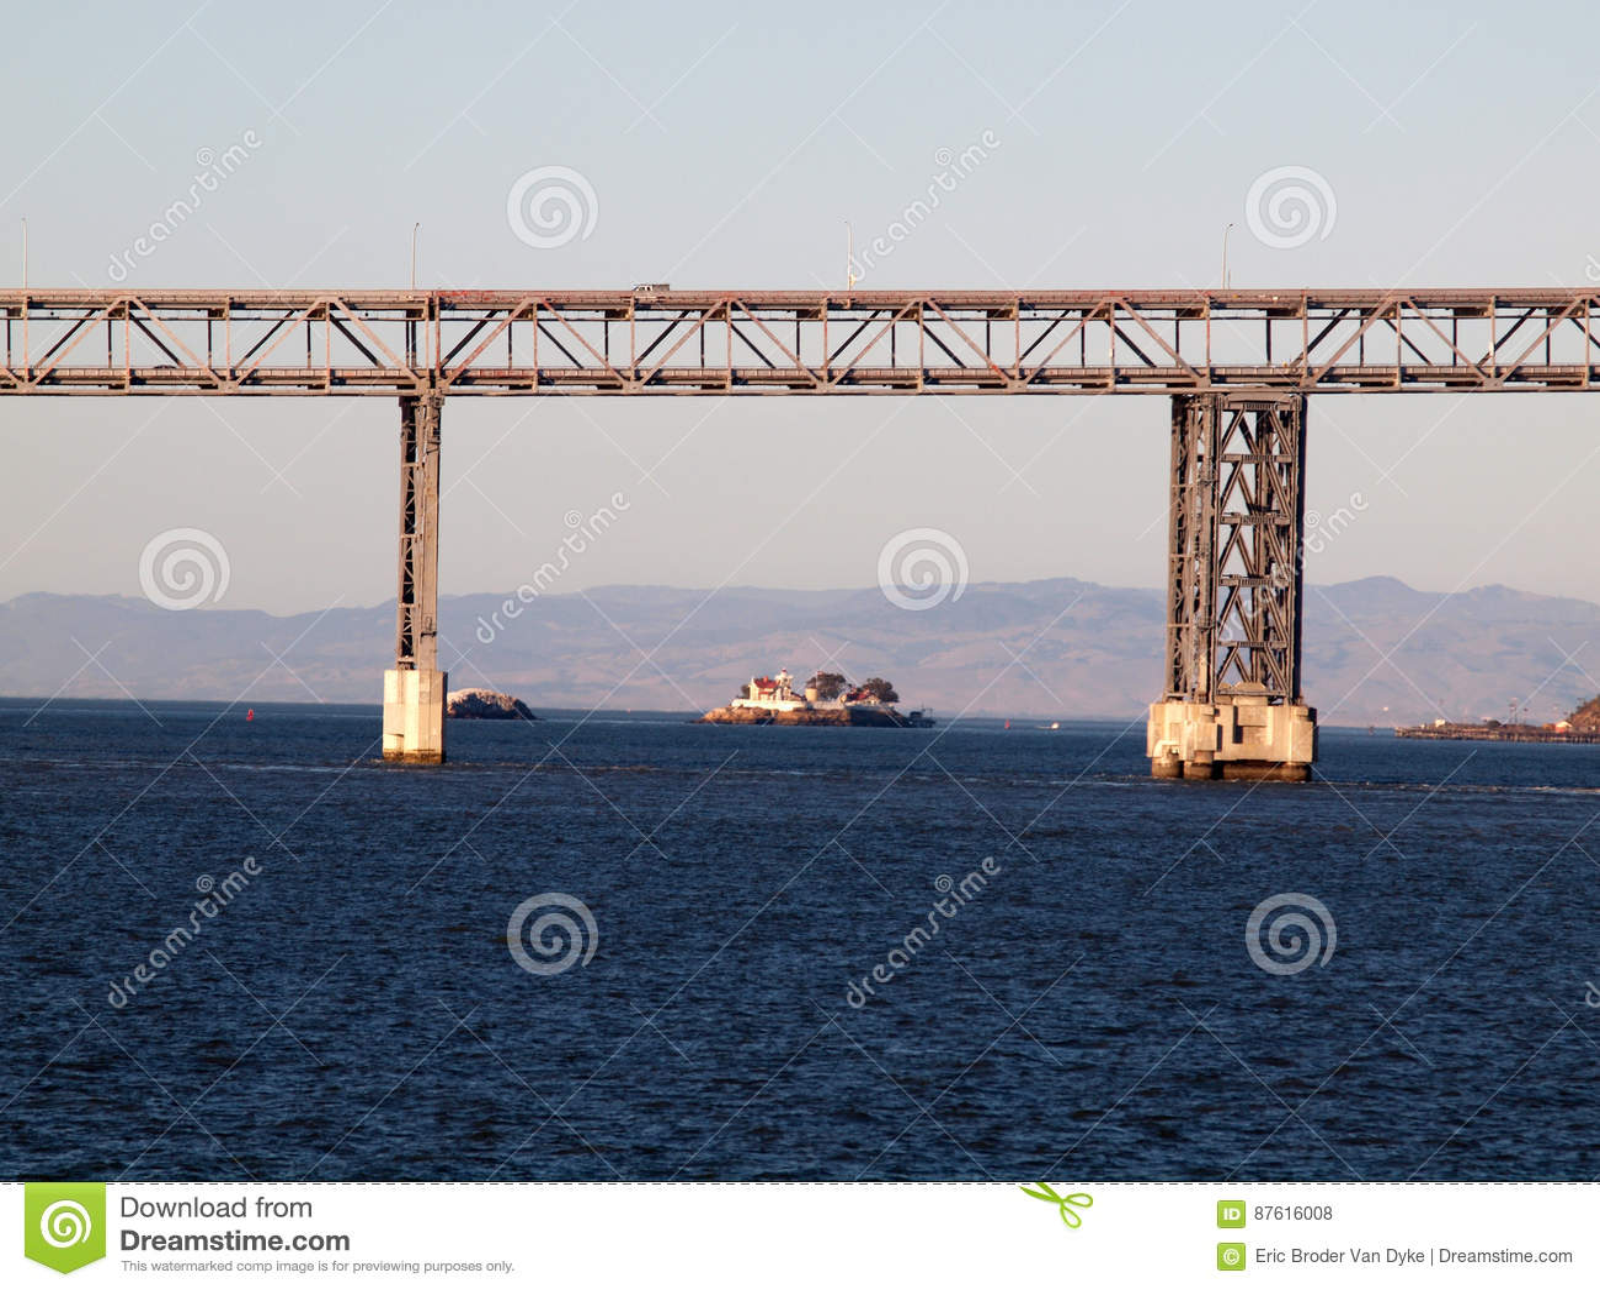 Richmond-San Rafael Bridge California